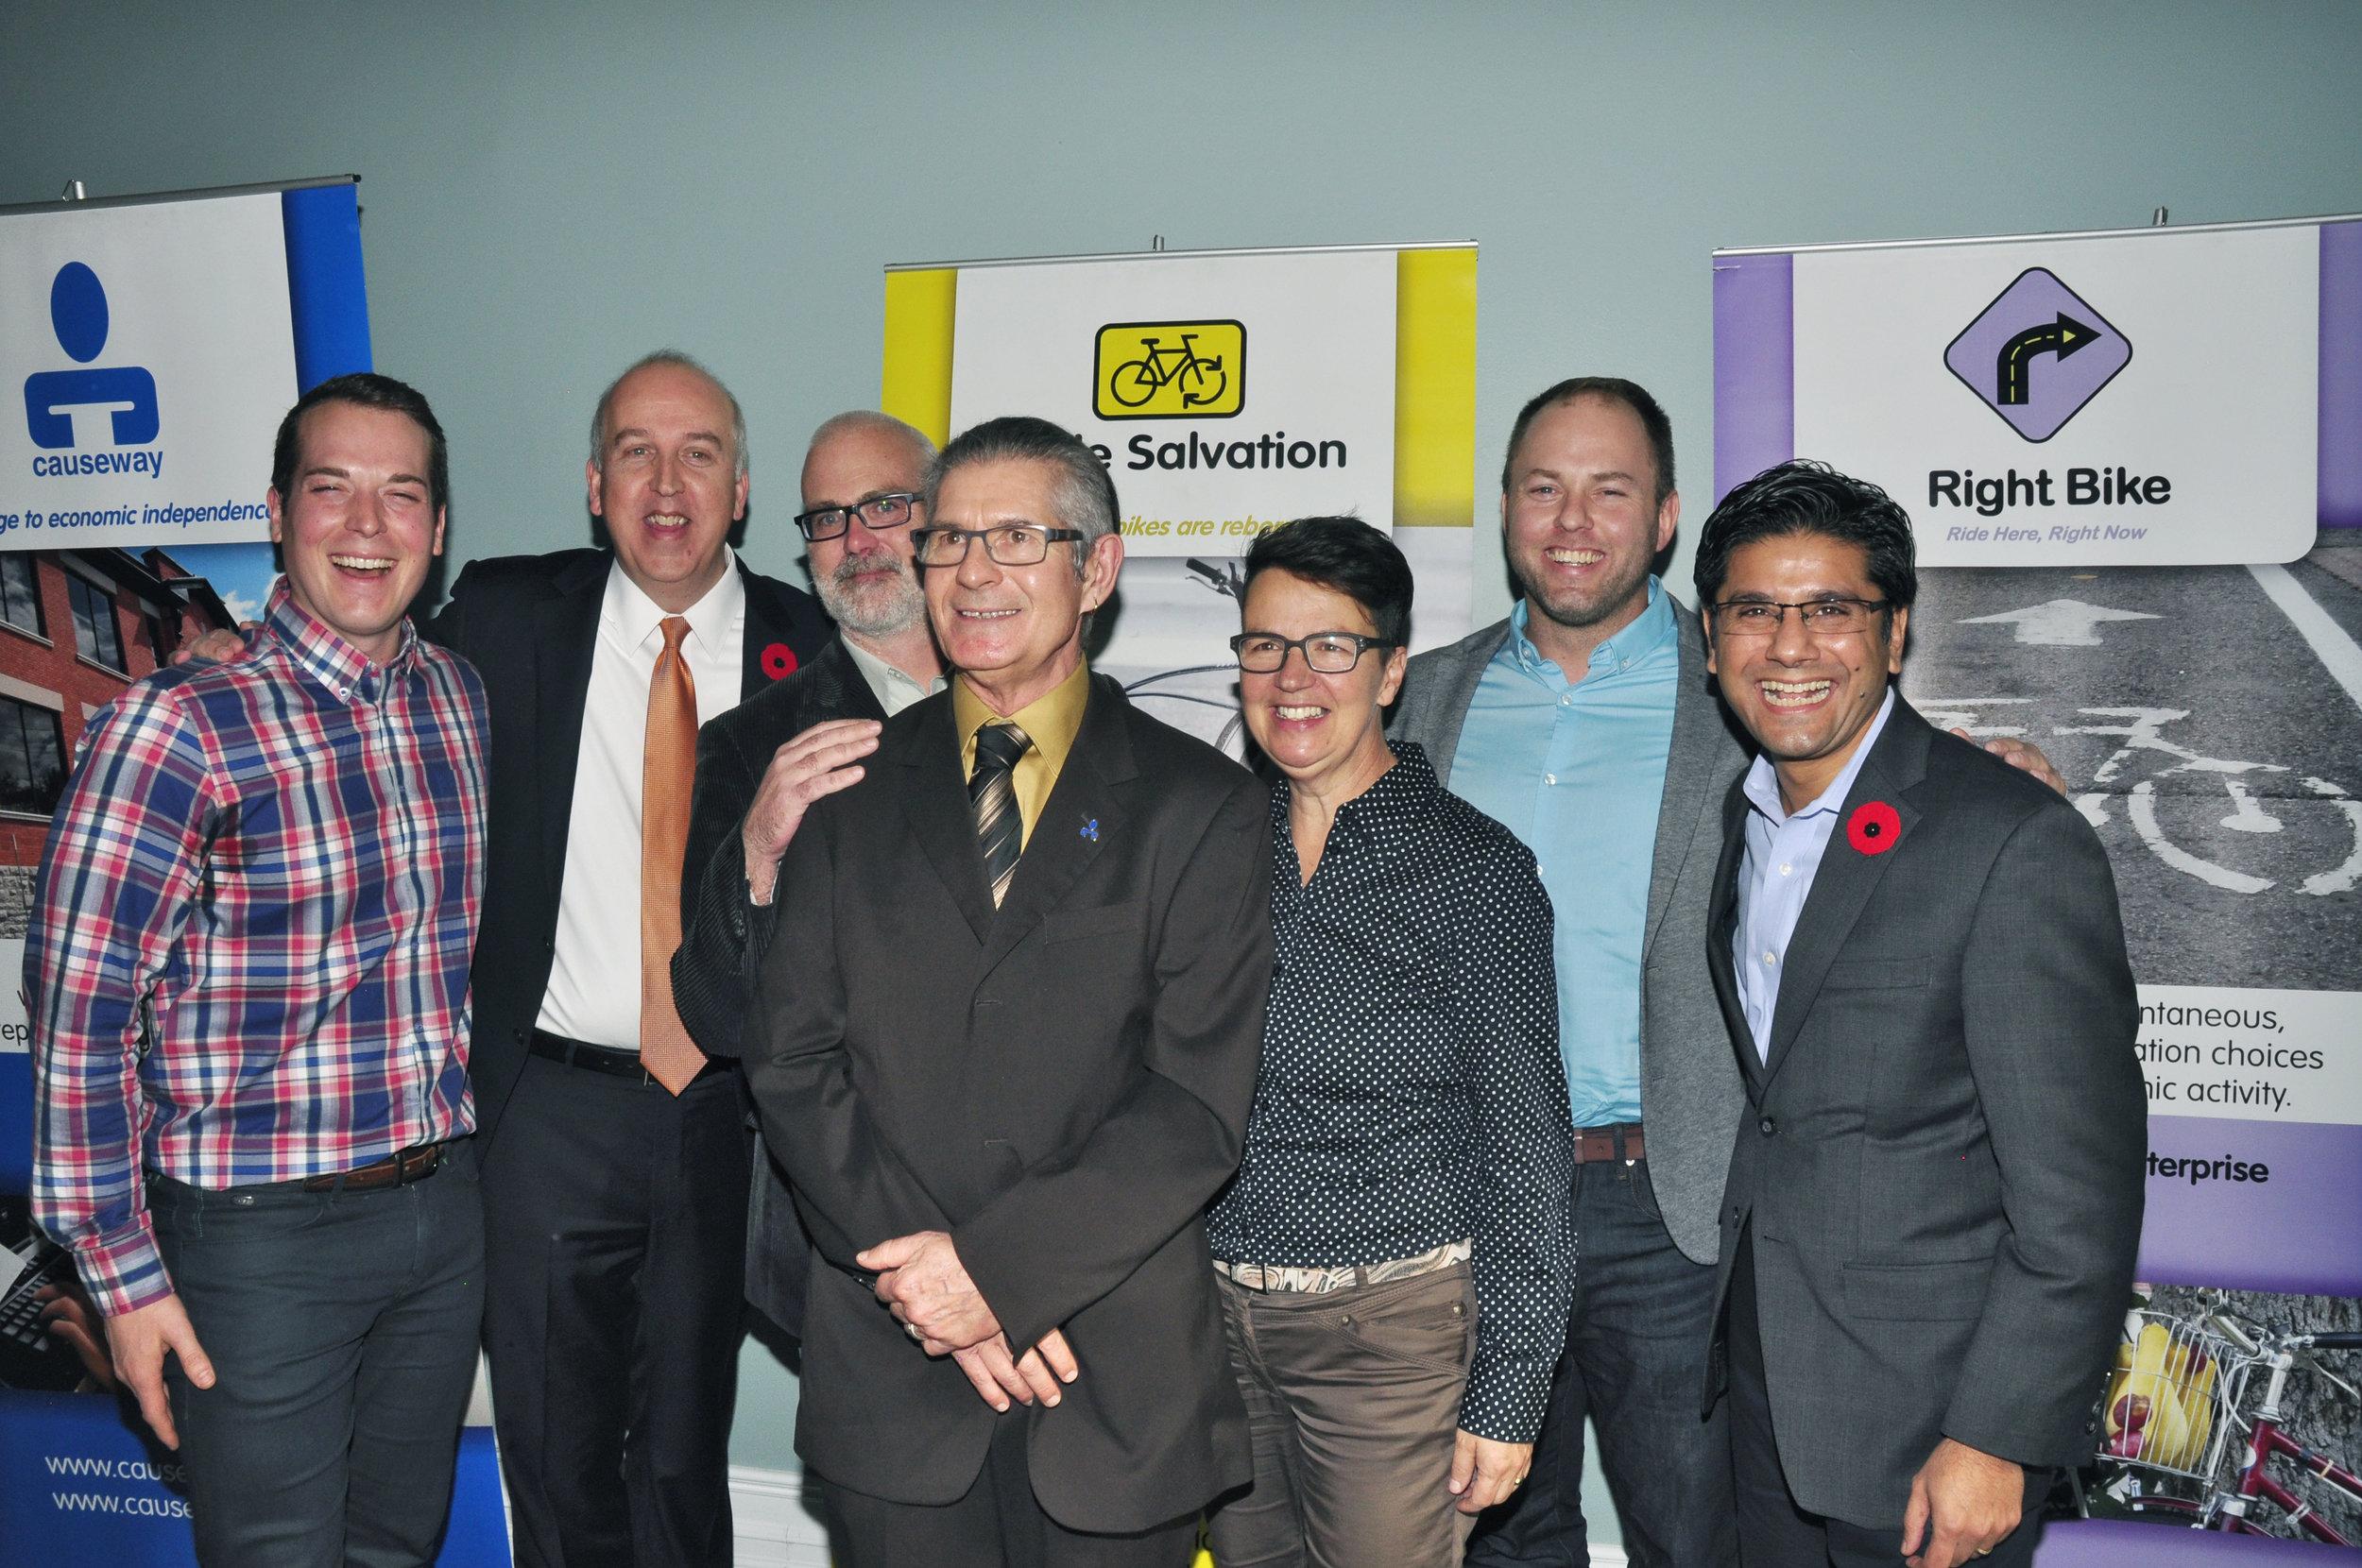 (Left to Right) Mathieu Fleury, Rob Paterson, Jeff Leiper, Don Palmer, Catherine McKenney, Doug Pawson, Yasir Naqvi - November 2016